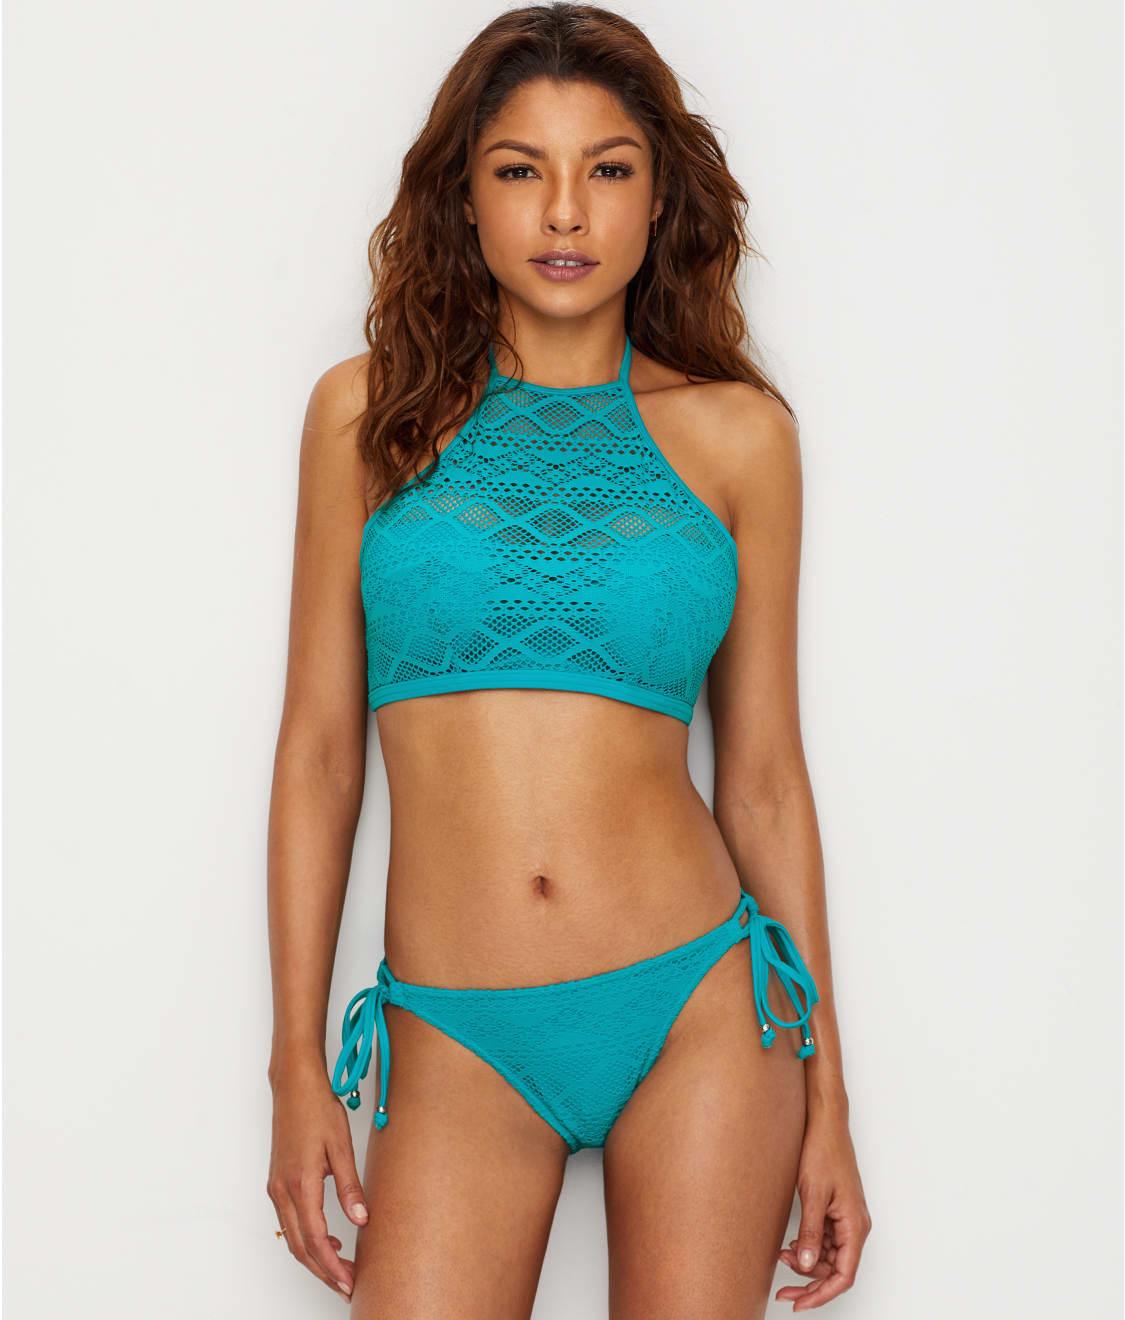 90e28e7609 See Sundance High Neck Underwire Bikini Top in Deep Ocean